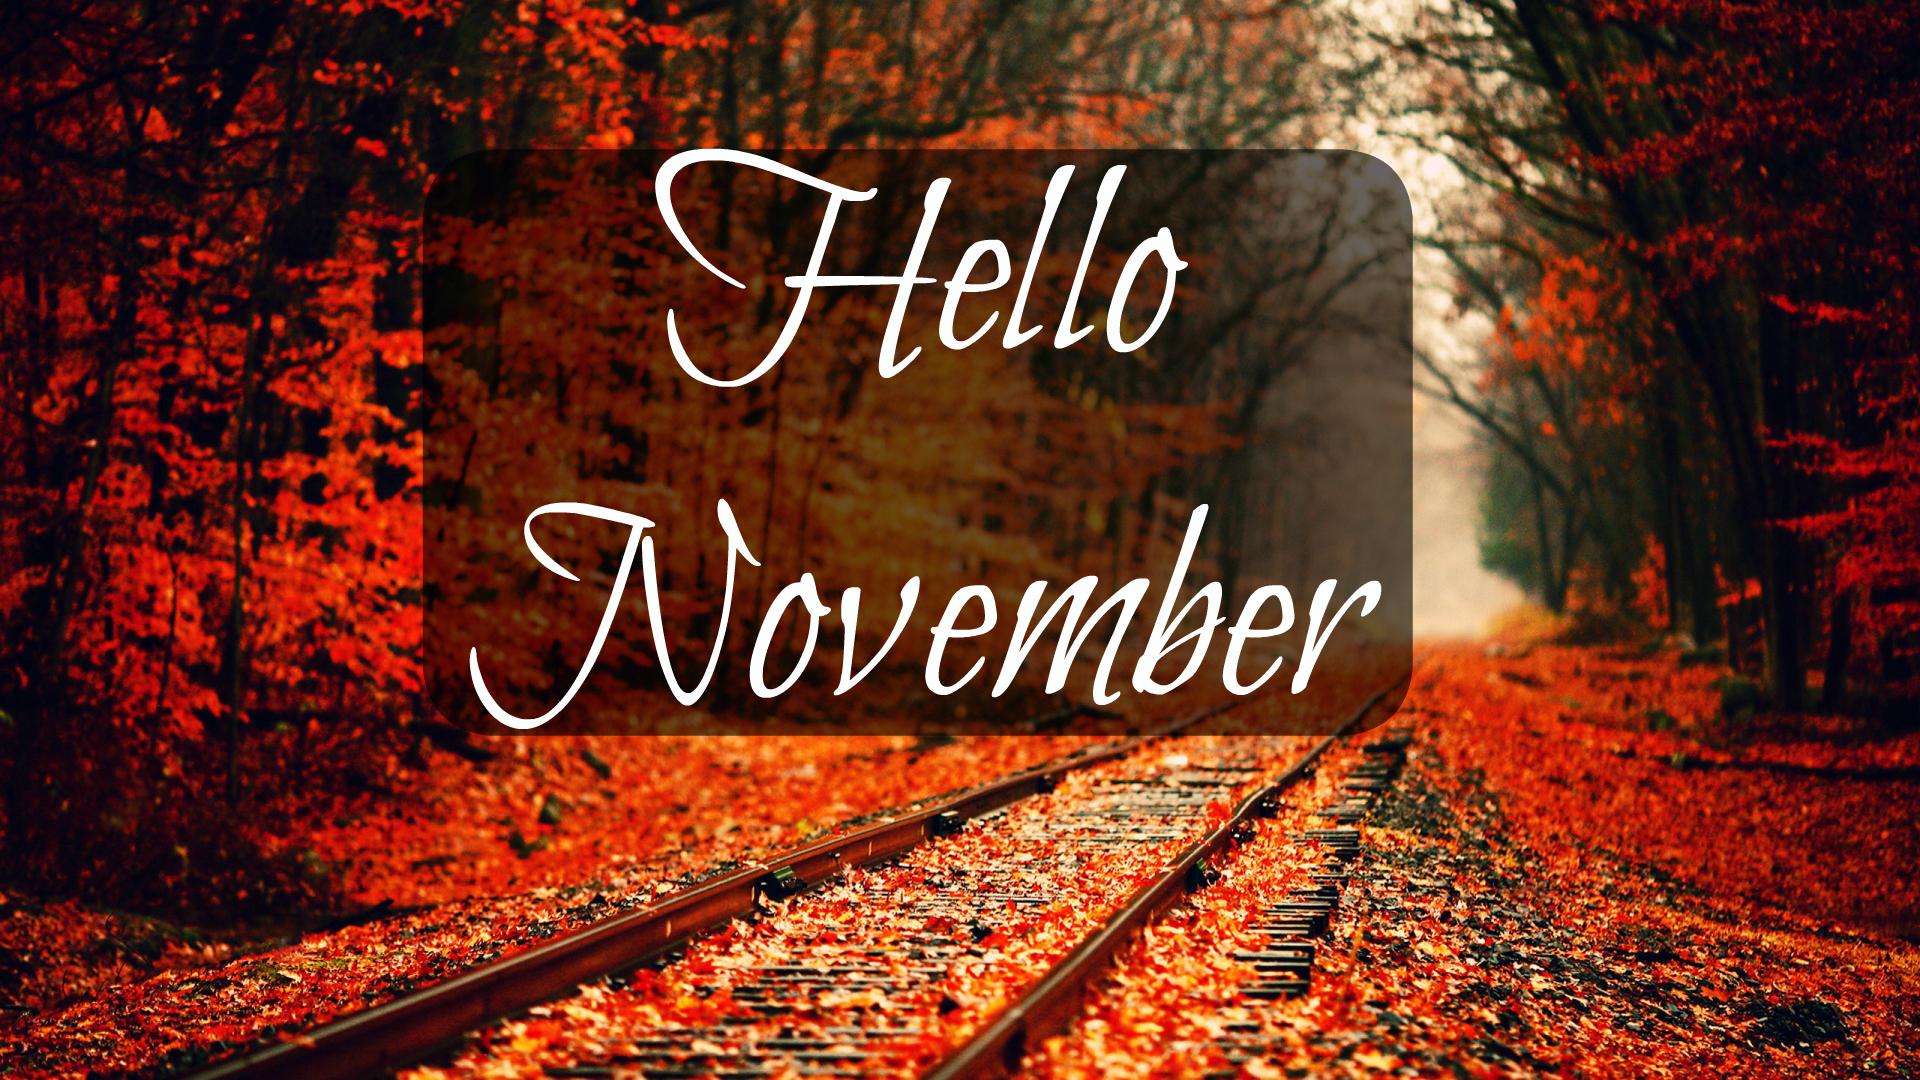 Hello November Wallpapers Hd For Desktop Iphone